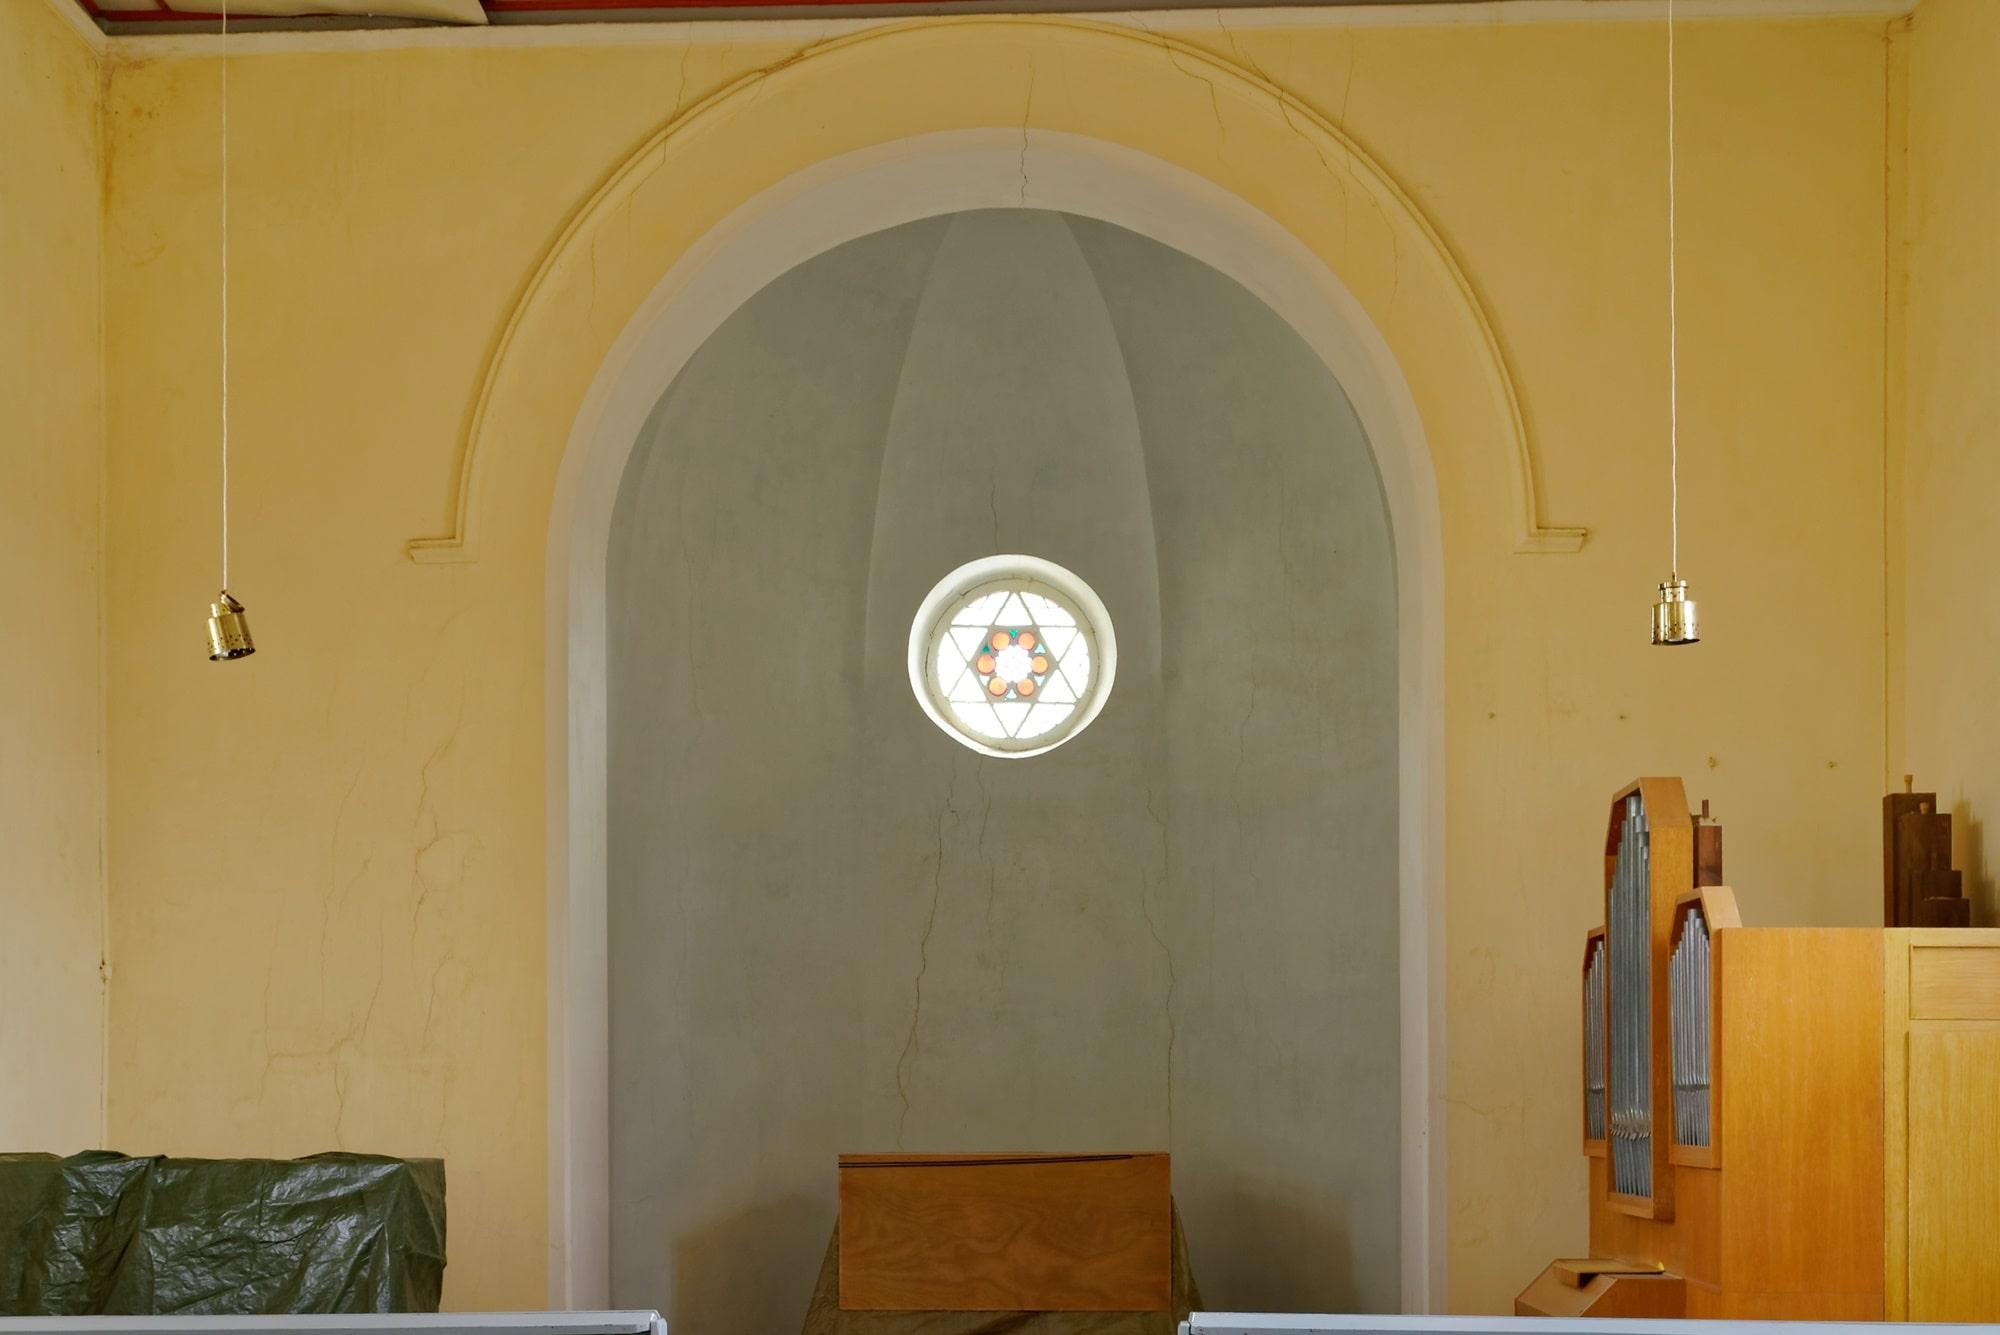 Kirche Wegezin Apsis am 14.07.2019